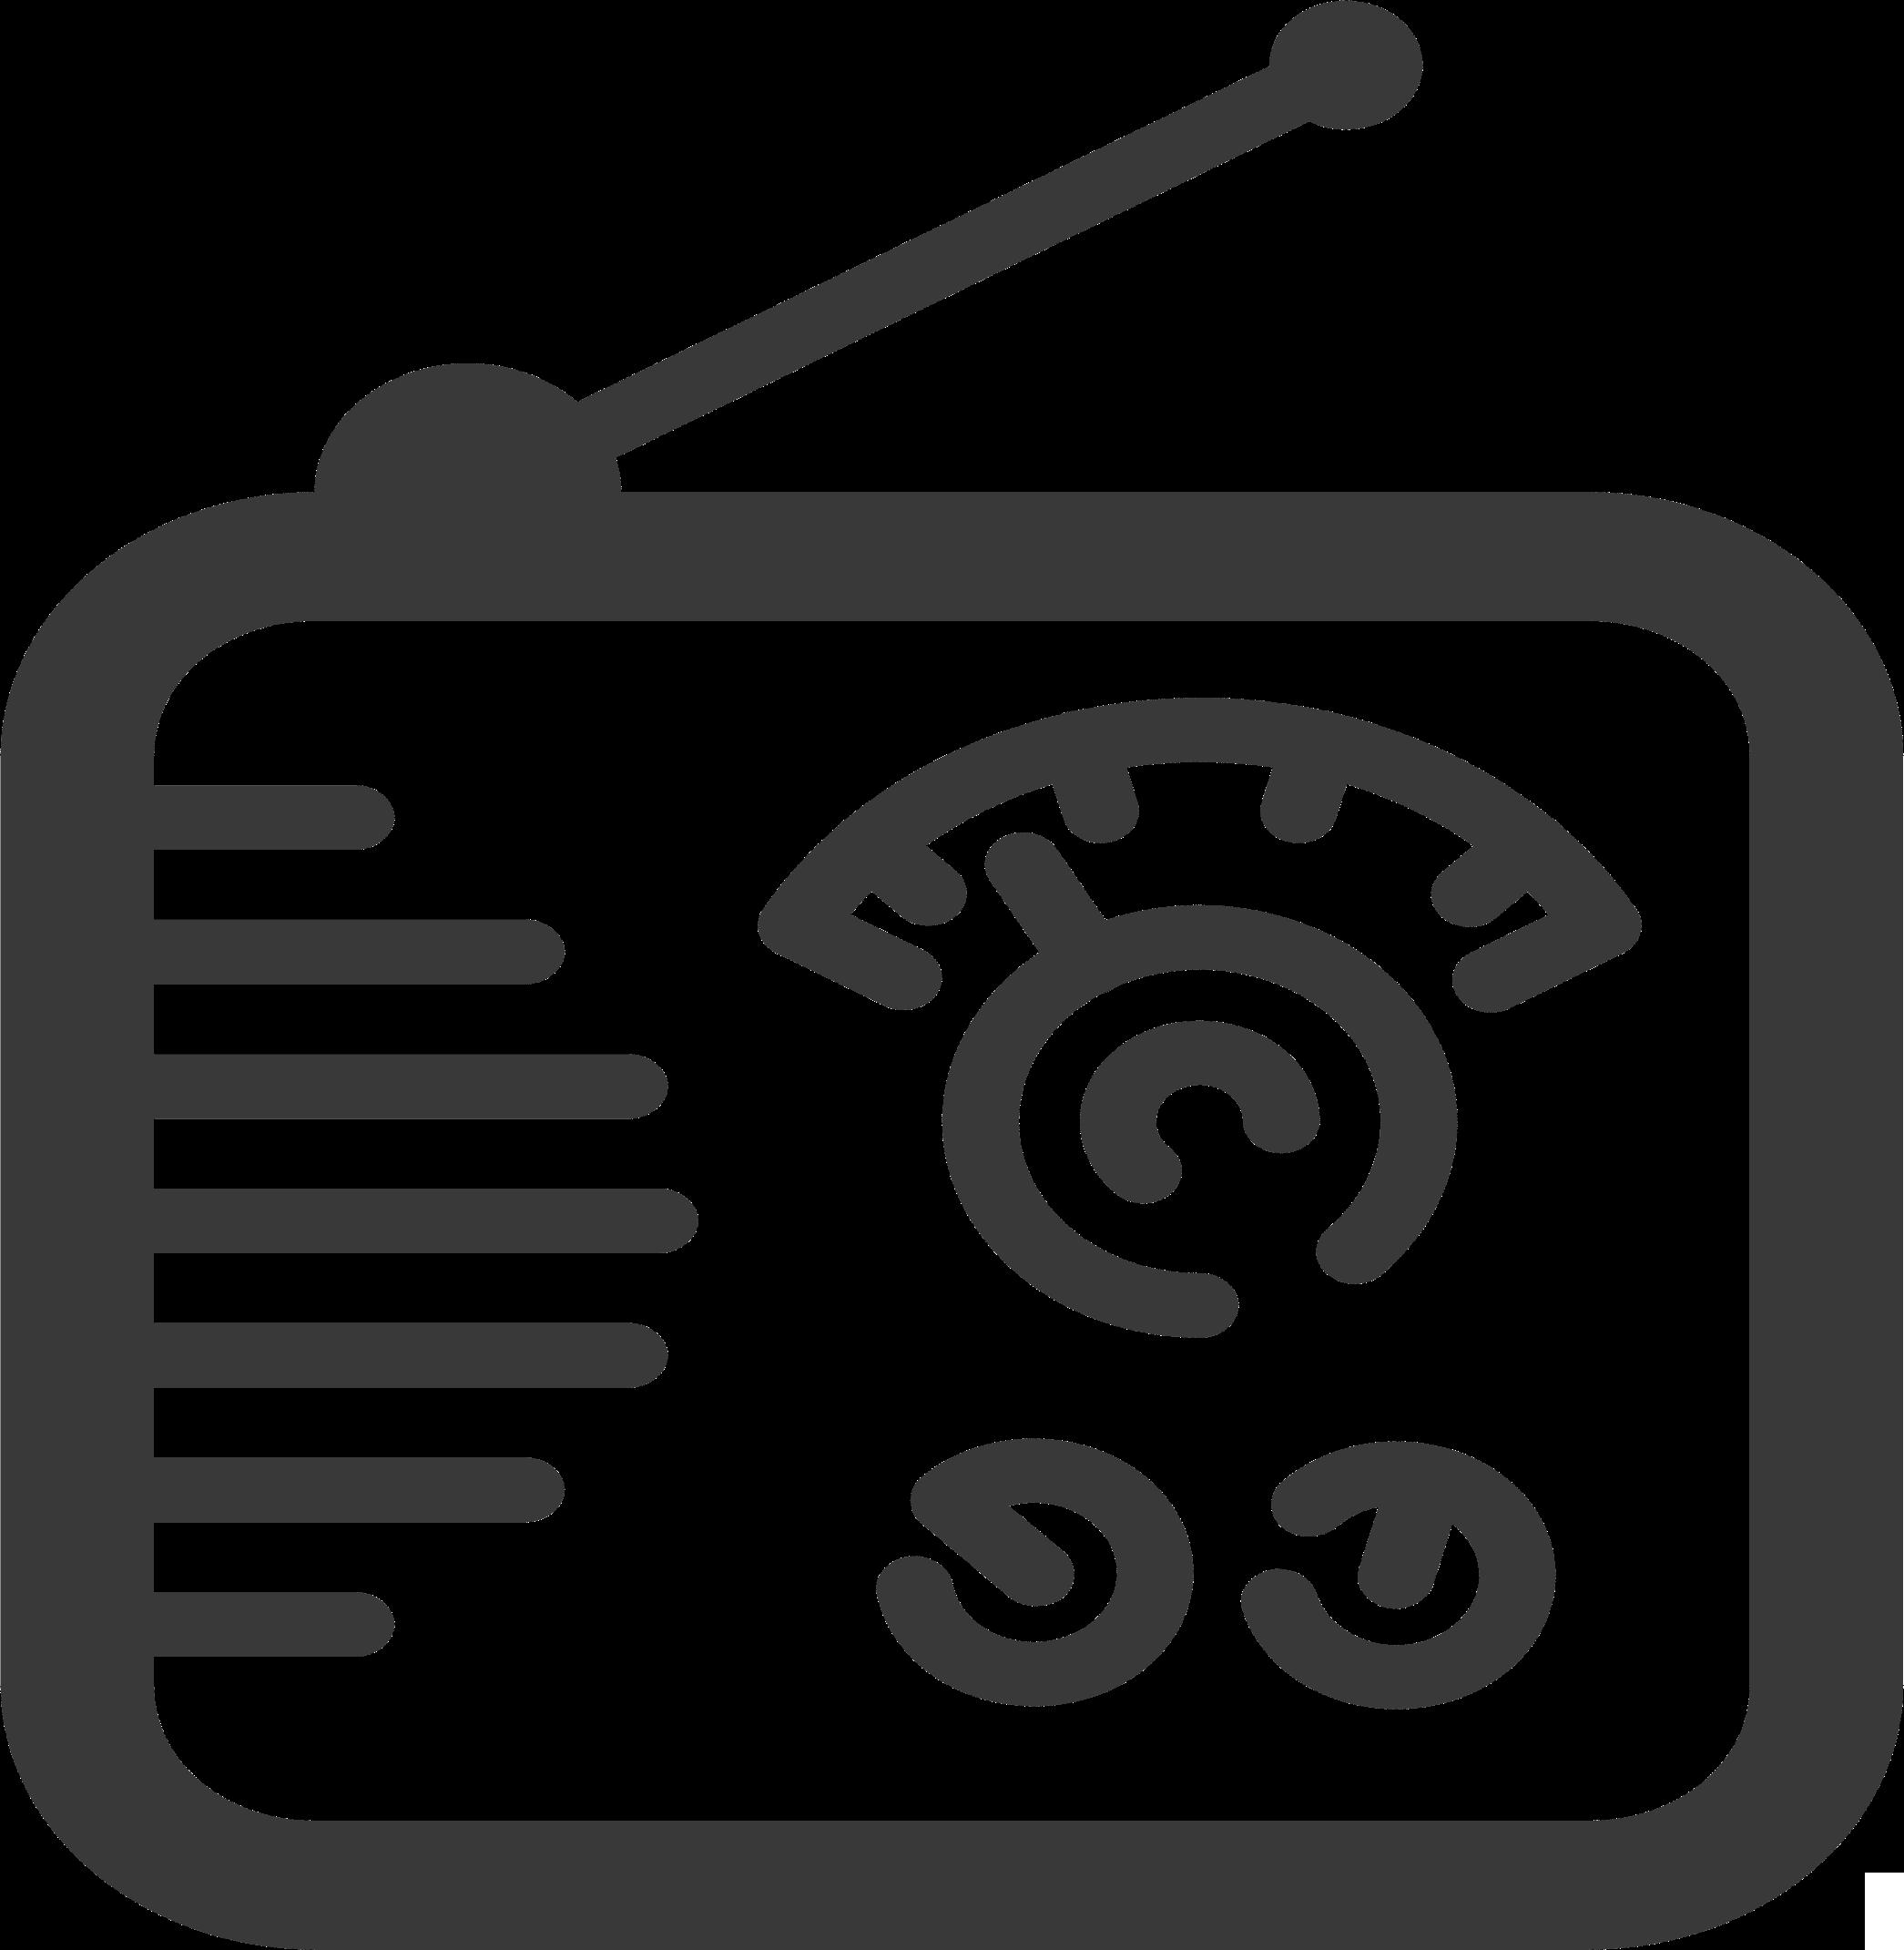 Radio Icon Vector Clipart image - Free stock photo - Public Domain ...